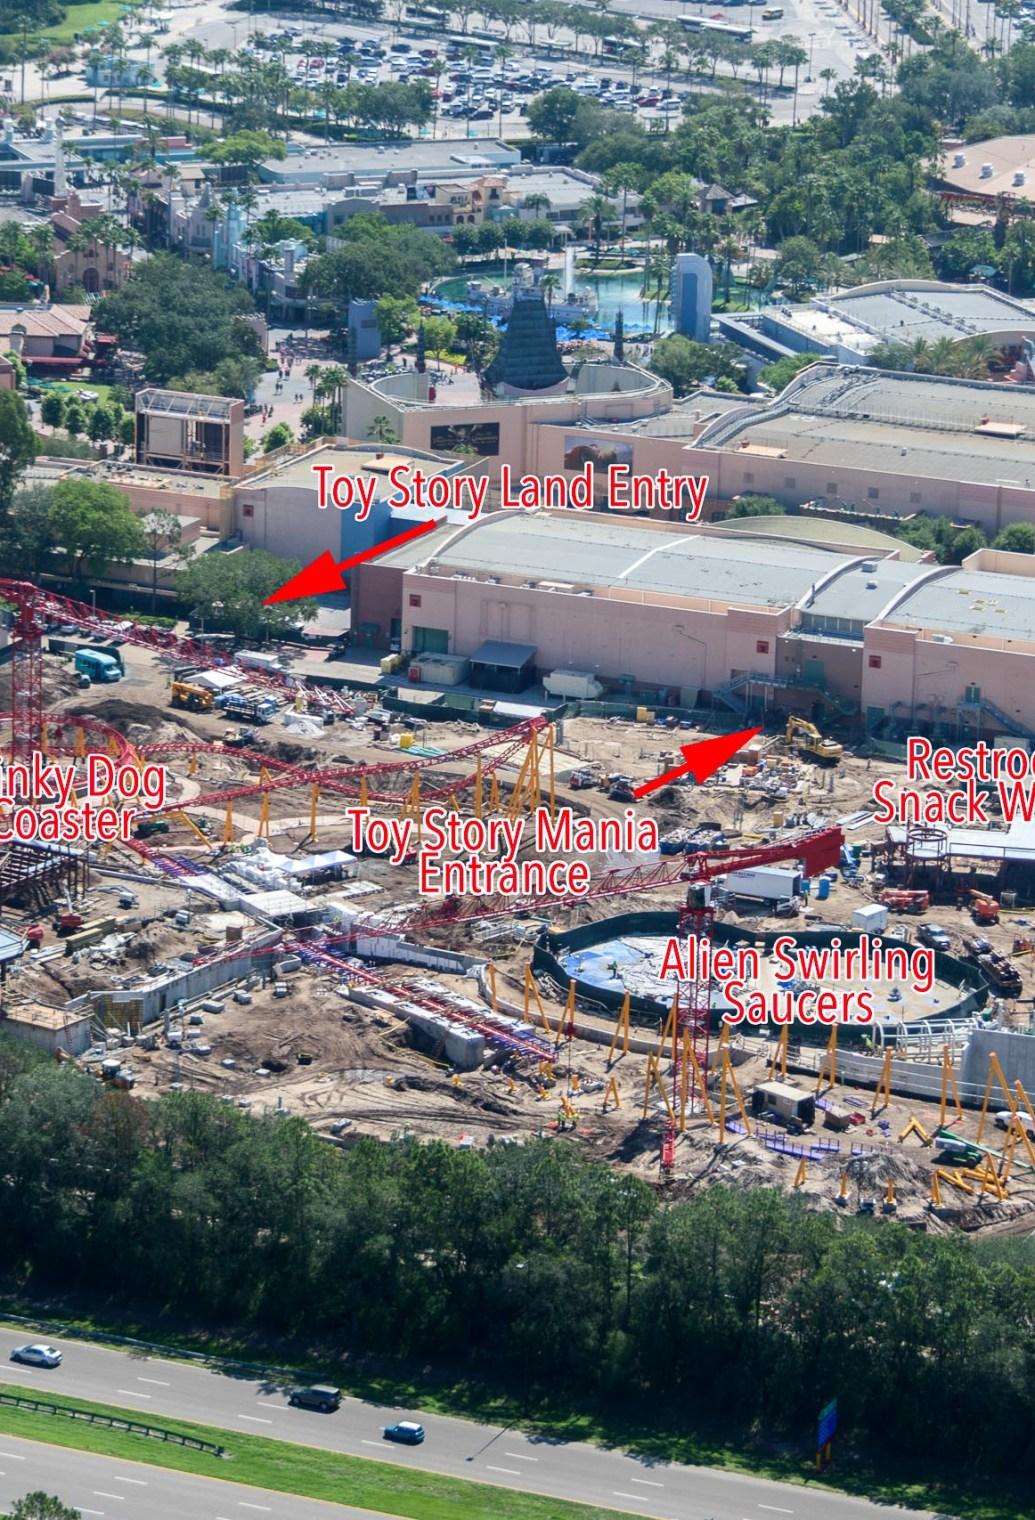 Aerial of Hollywood Studios